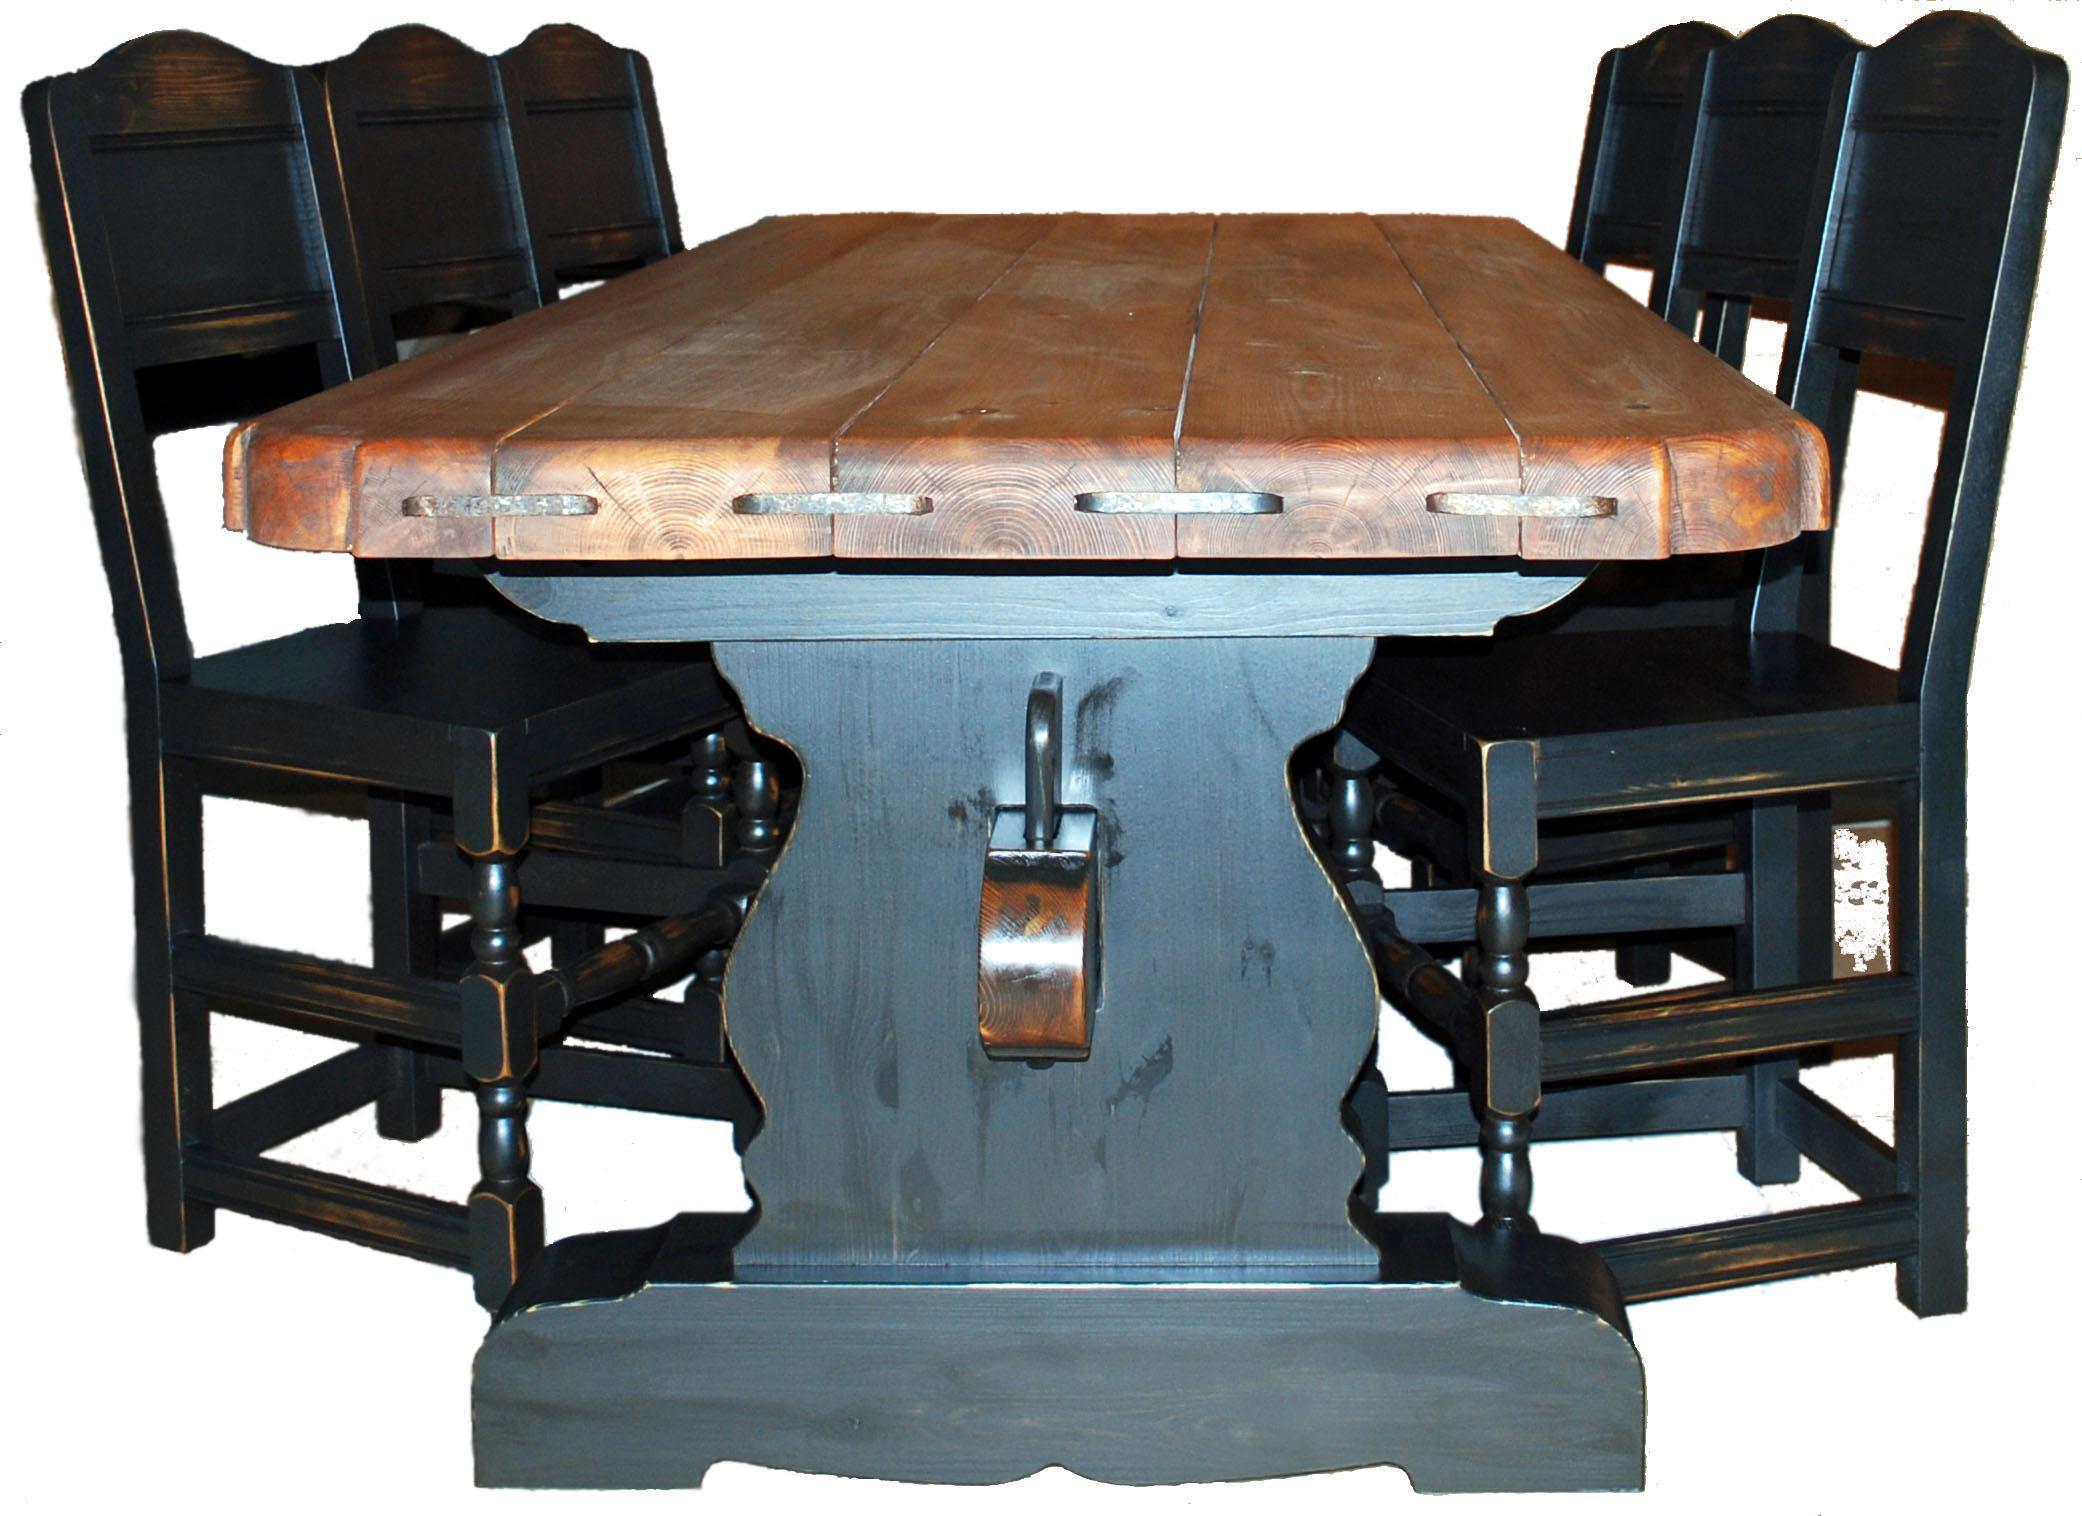 Ensemble salle manger table avec 2 bancs pictures to pin for Ensemble table et 6 chaise salle a manger